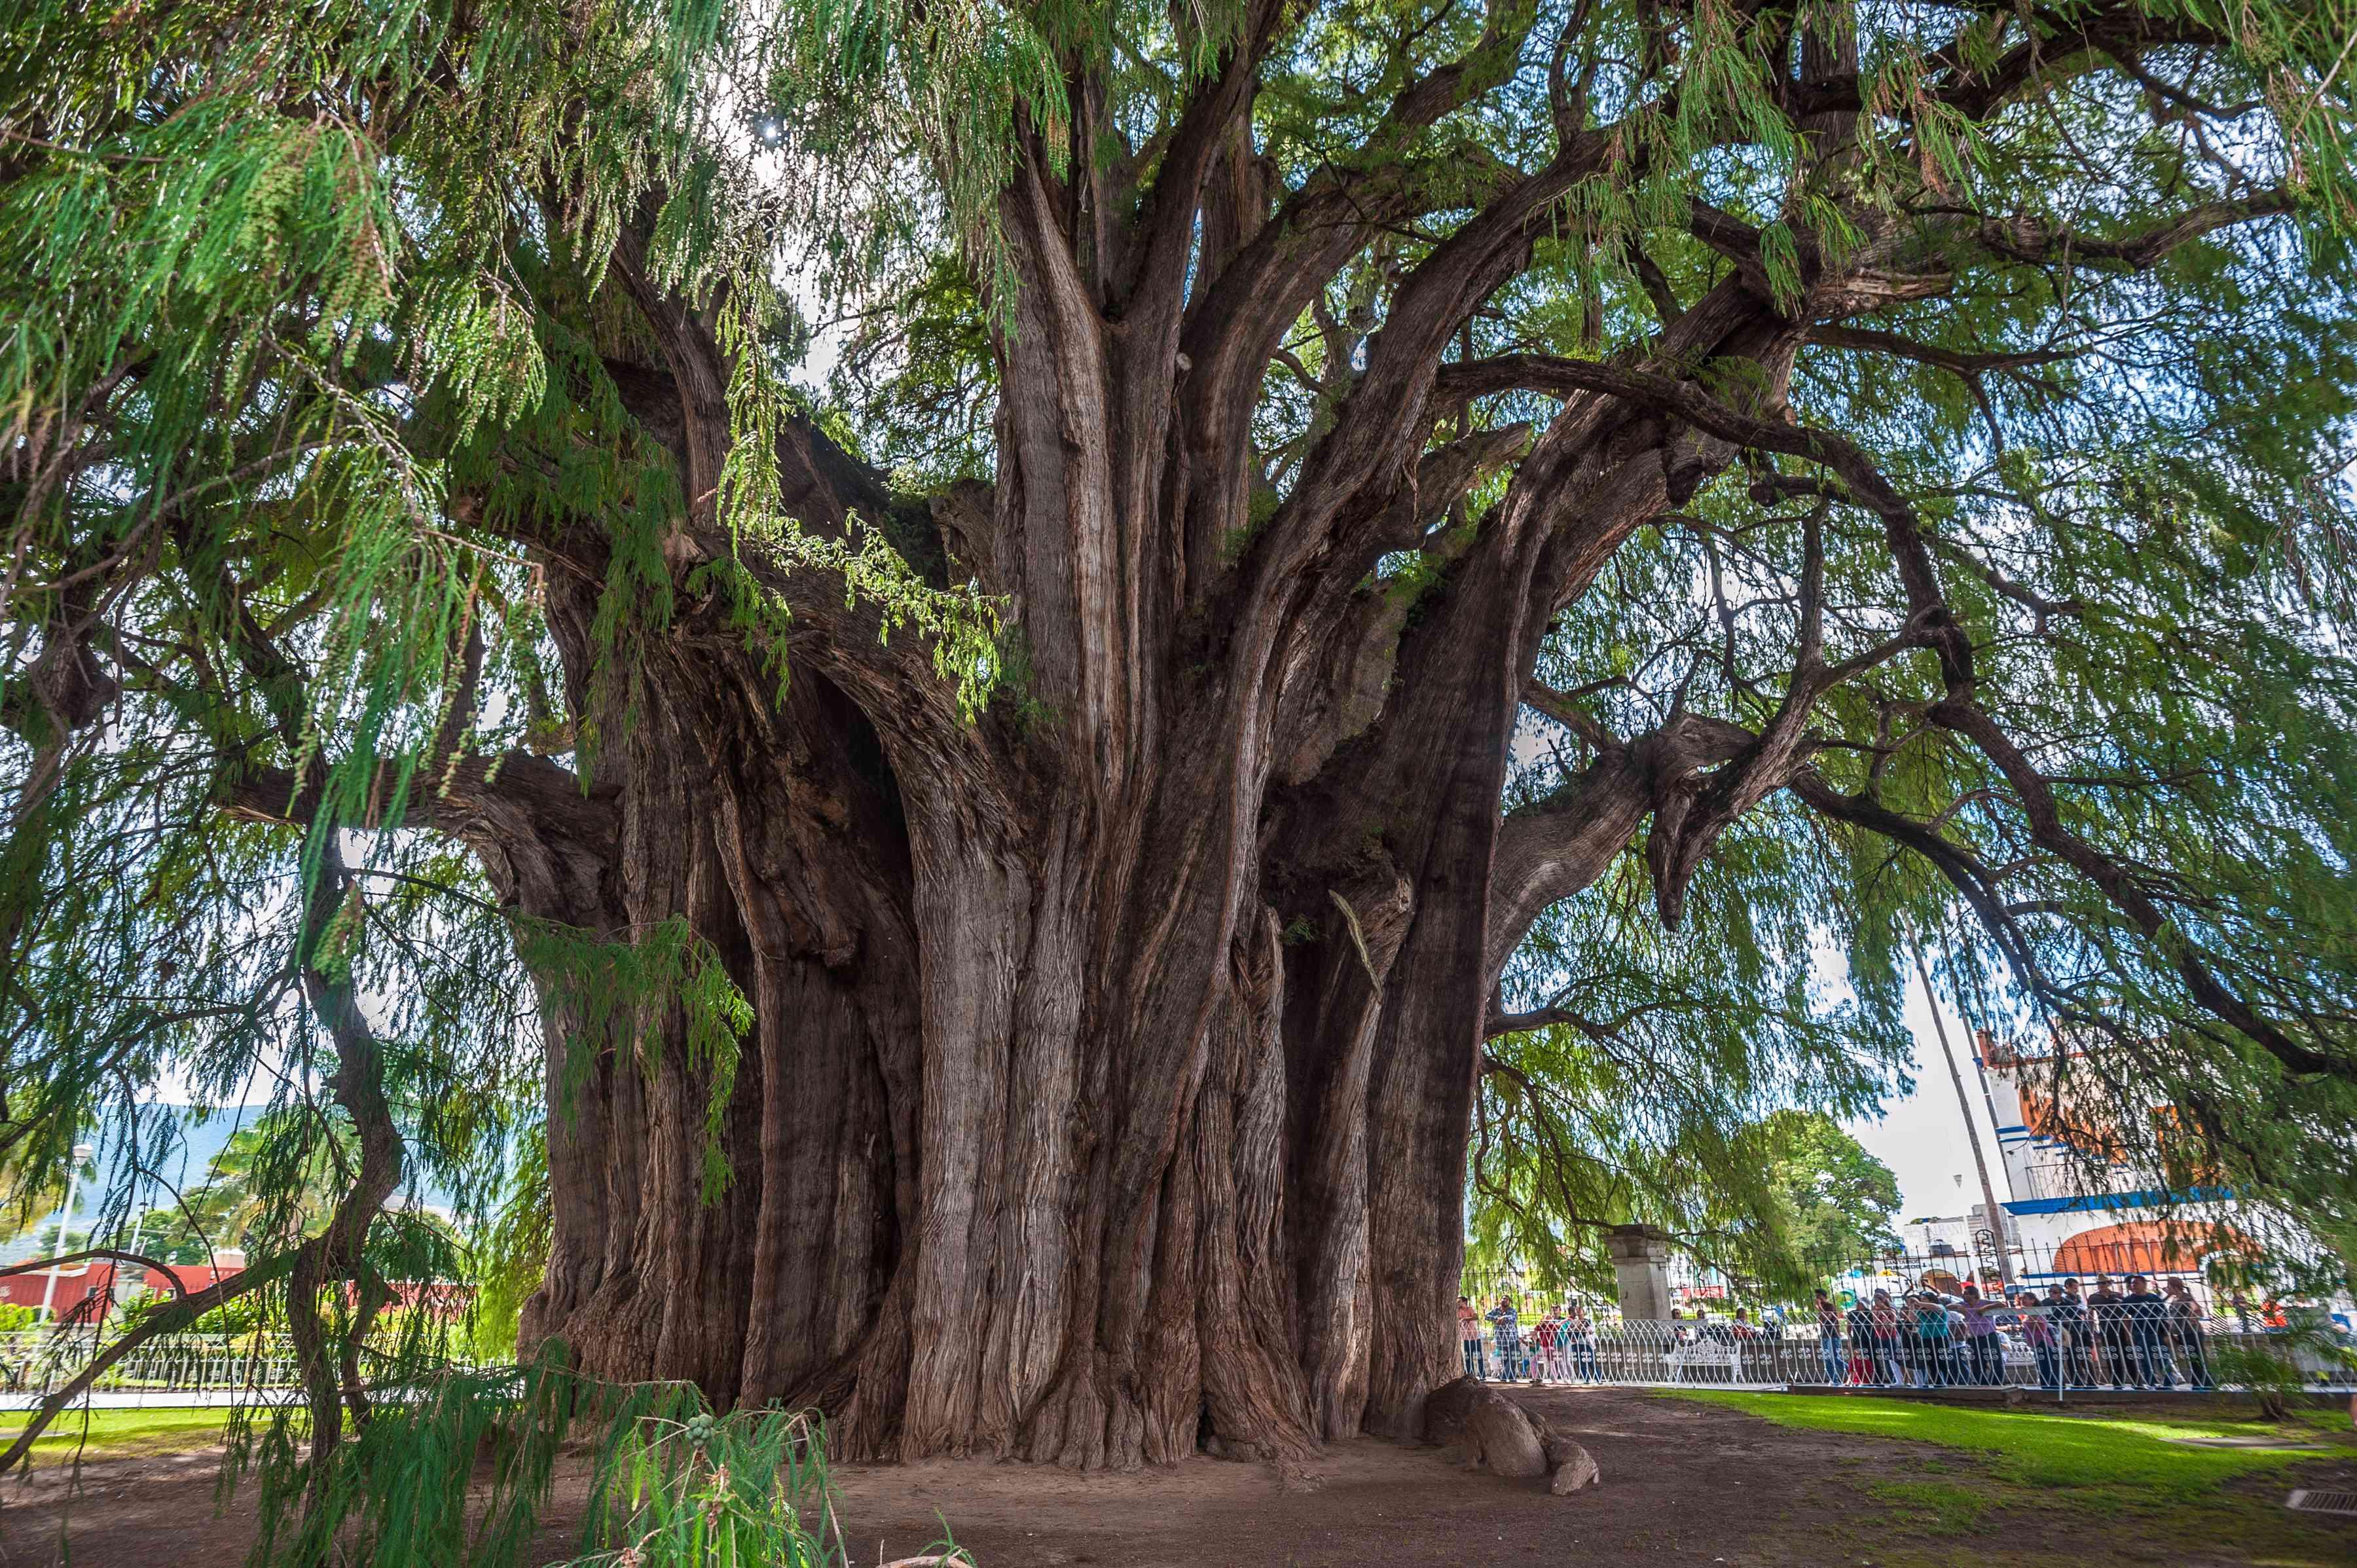 Arbol del Tule, a giant sacred tree in Tule, Mexico